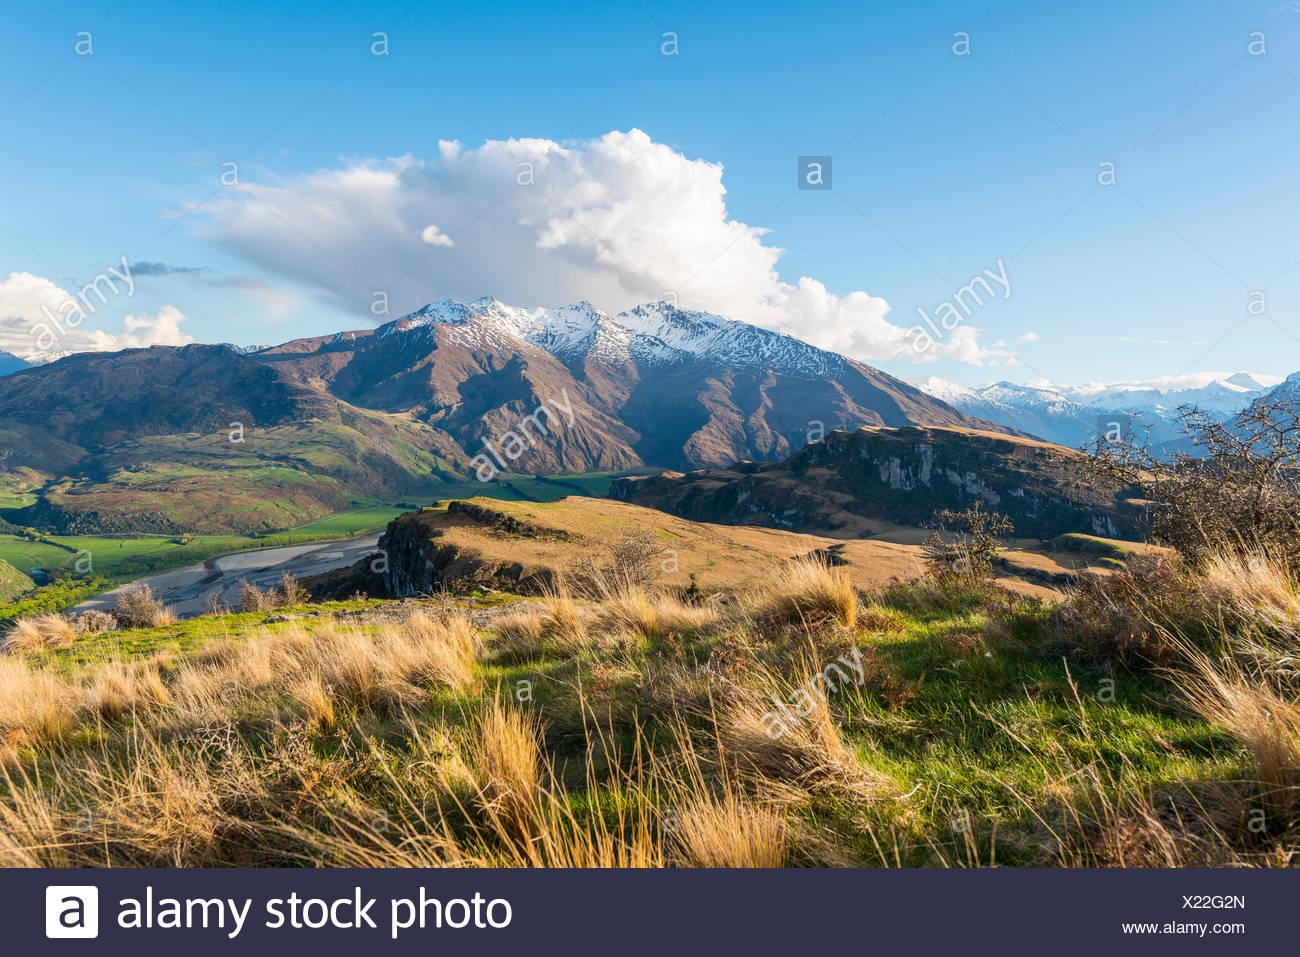 View of mountains with snow, Wanaka Lake, Rocky Peak, Glendhu Bay, Otago, Southland, New Zealand - Stock Image